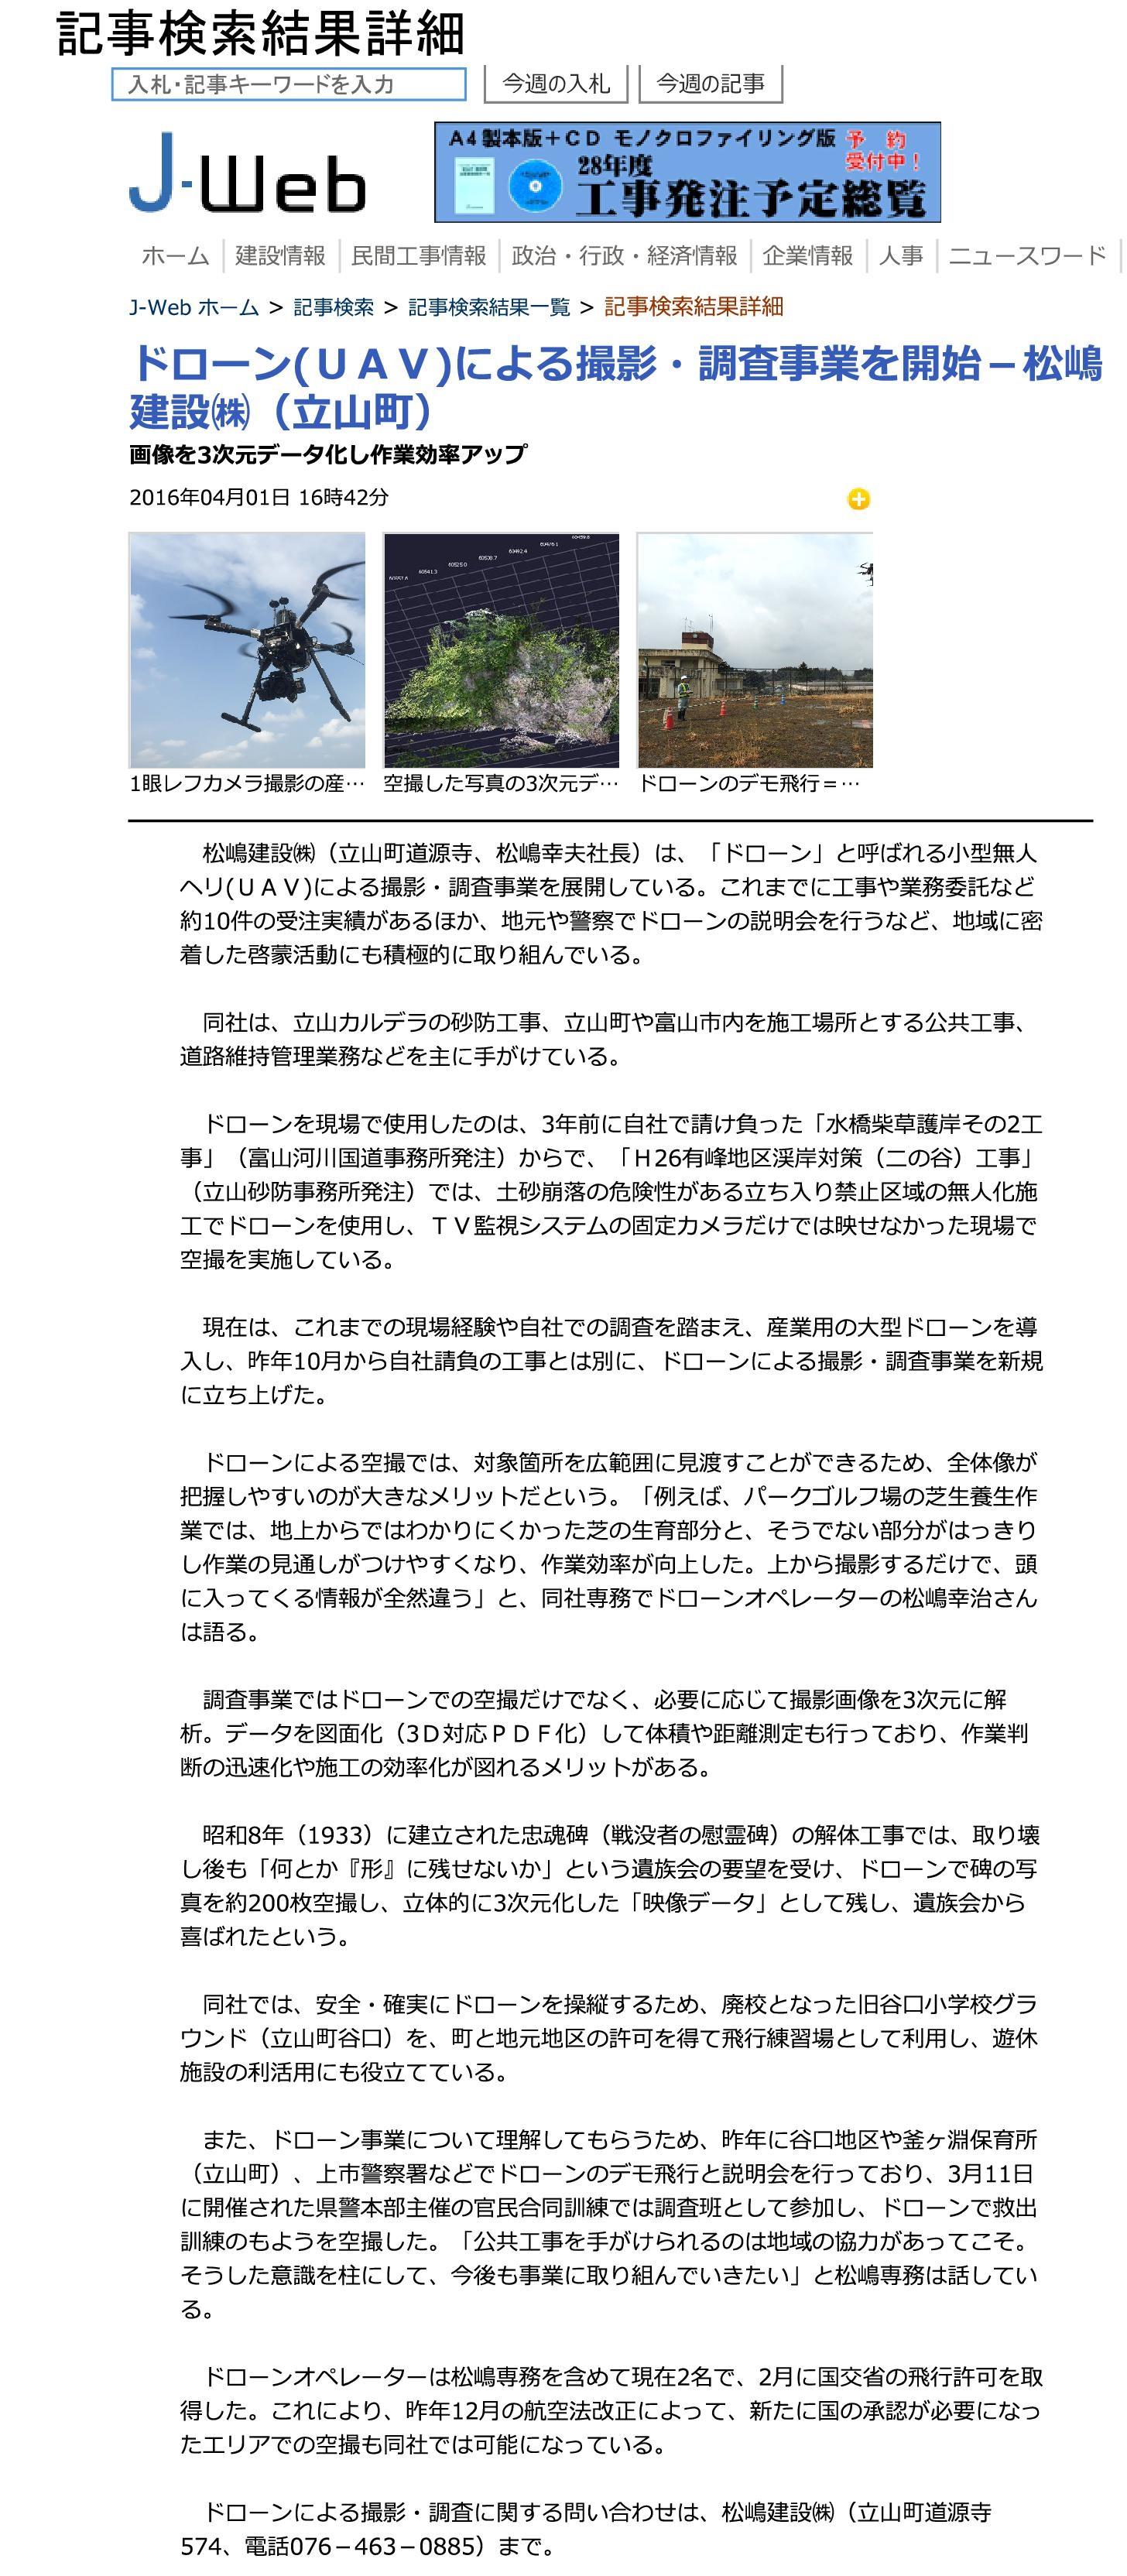 新聞記事 実業新報社 ドローン.jpg